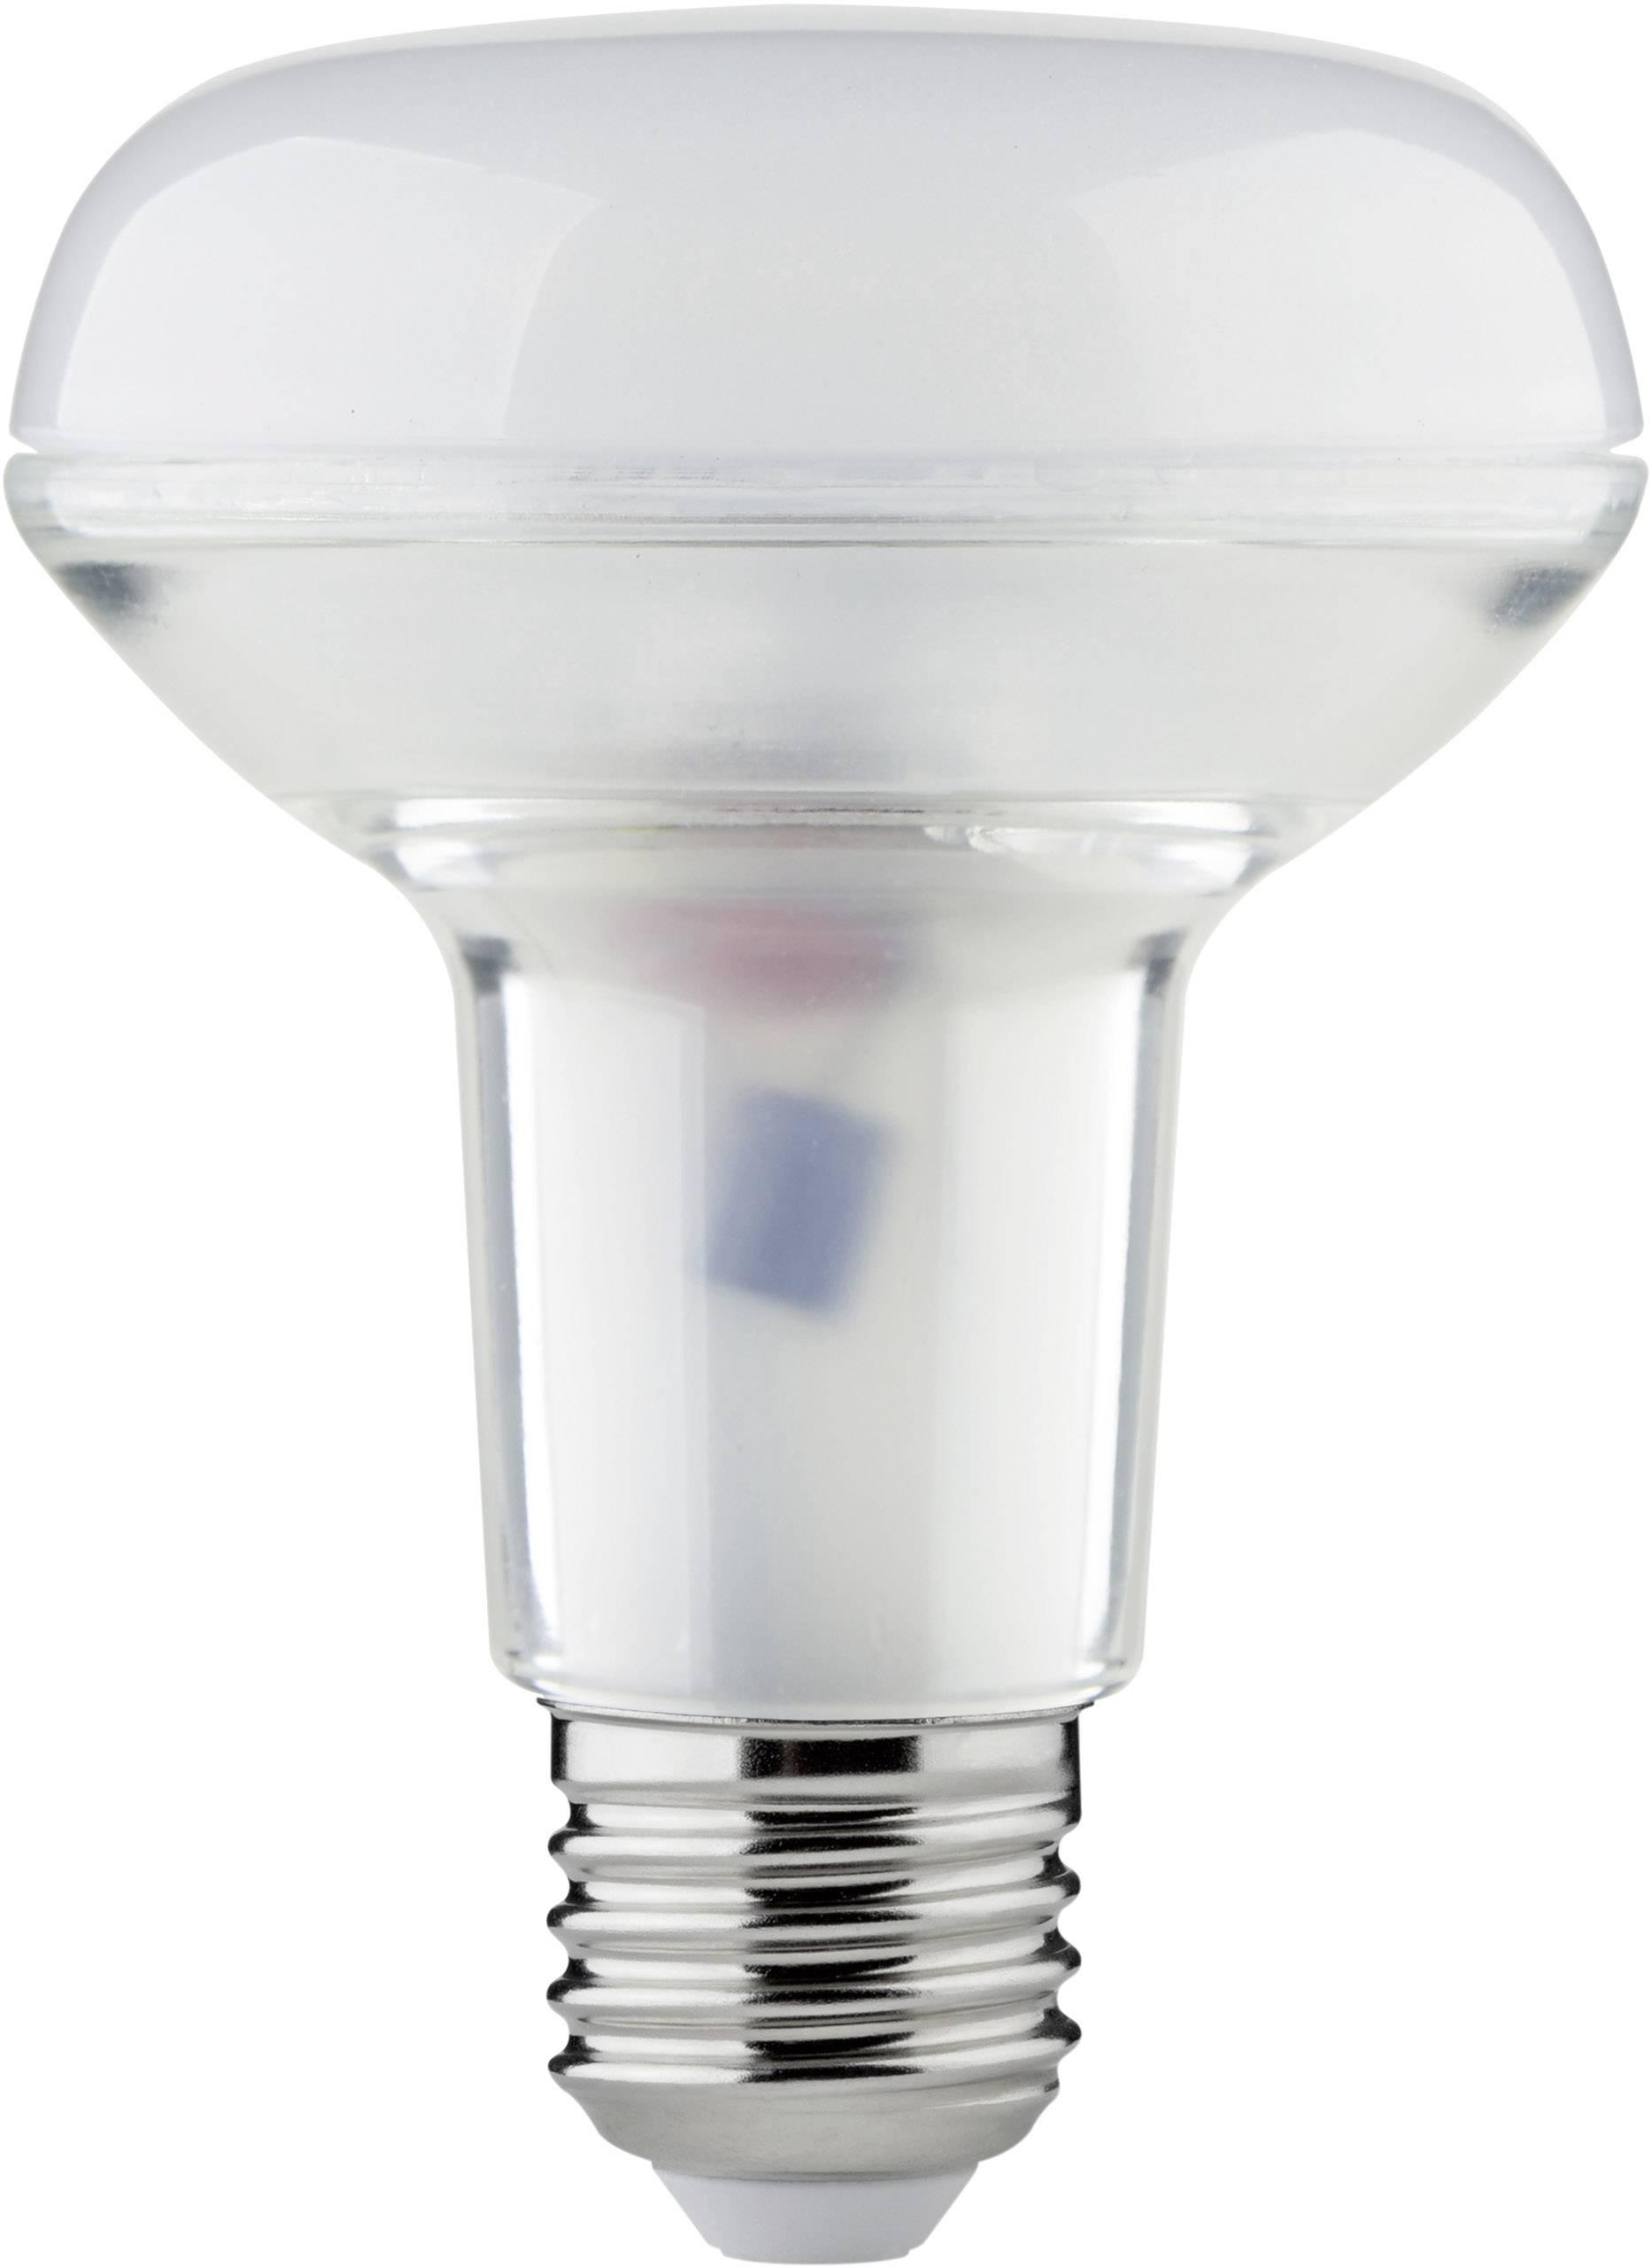 Light Zone Beleuchteter Spiegel 5W 8x 0,5W LED 6500K Sensordimmer 55cm 230V